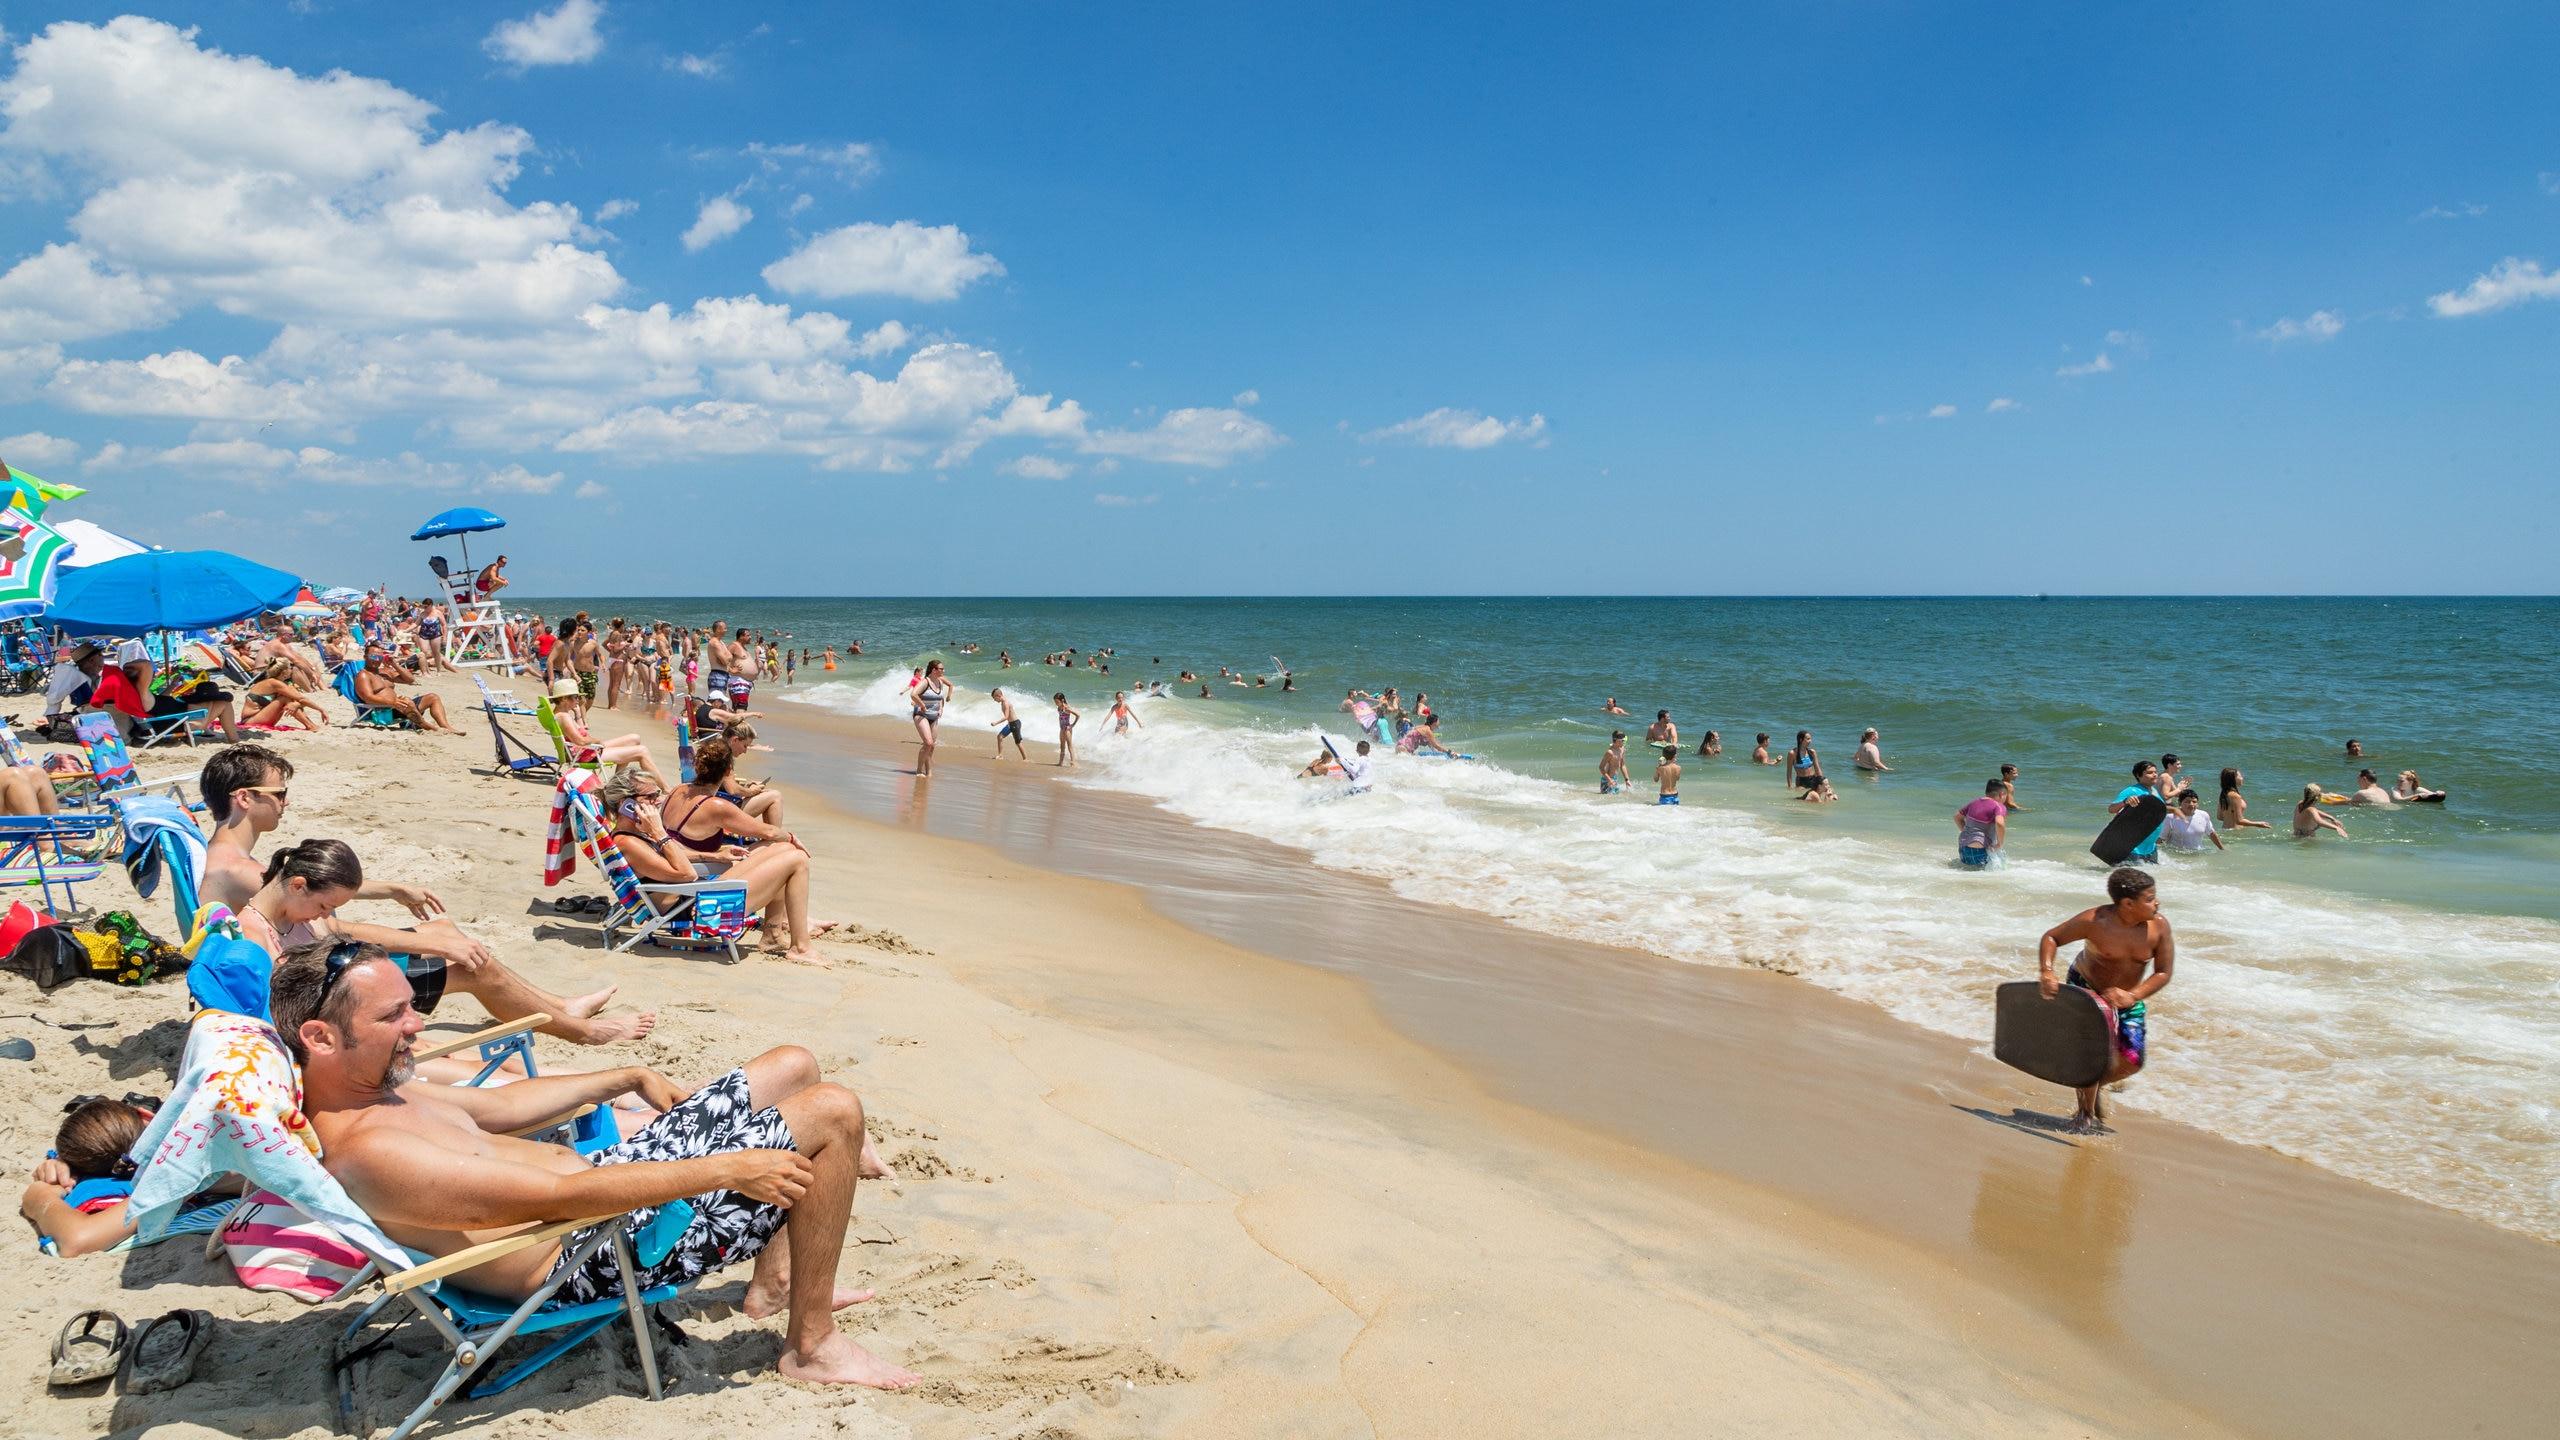 North Ocean City, Ocean City, Maryland, USA